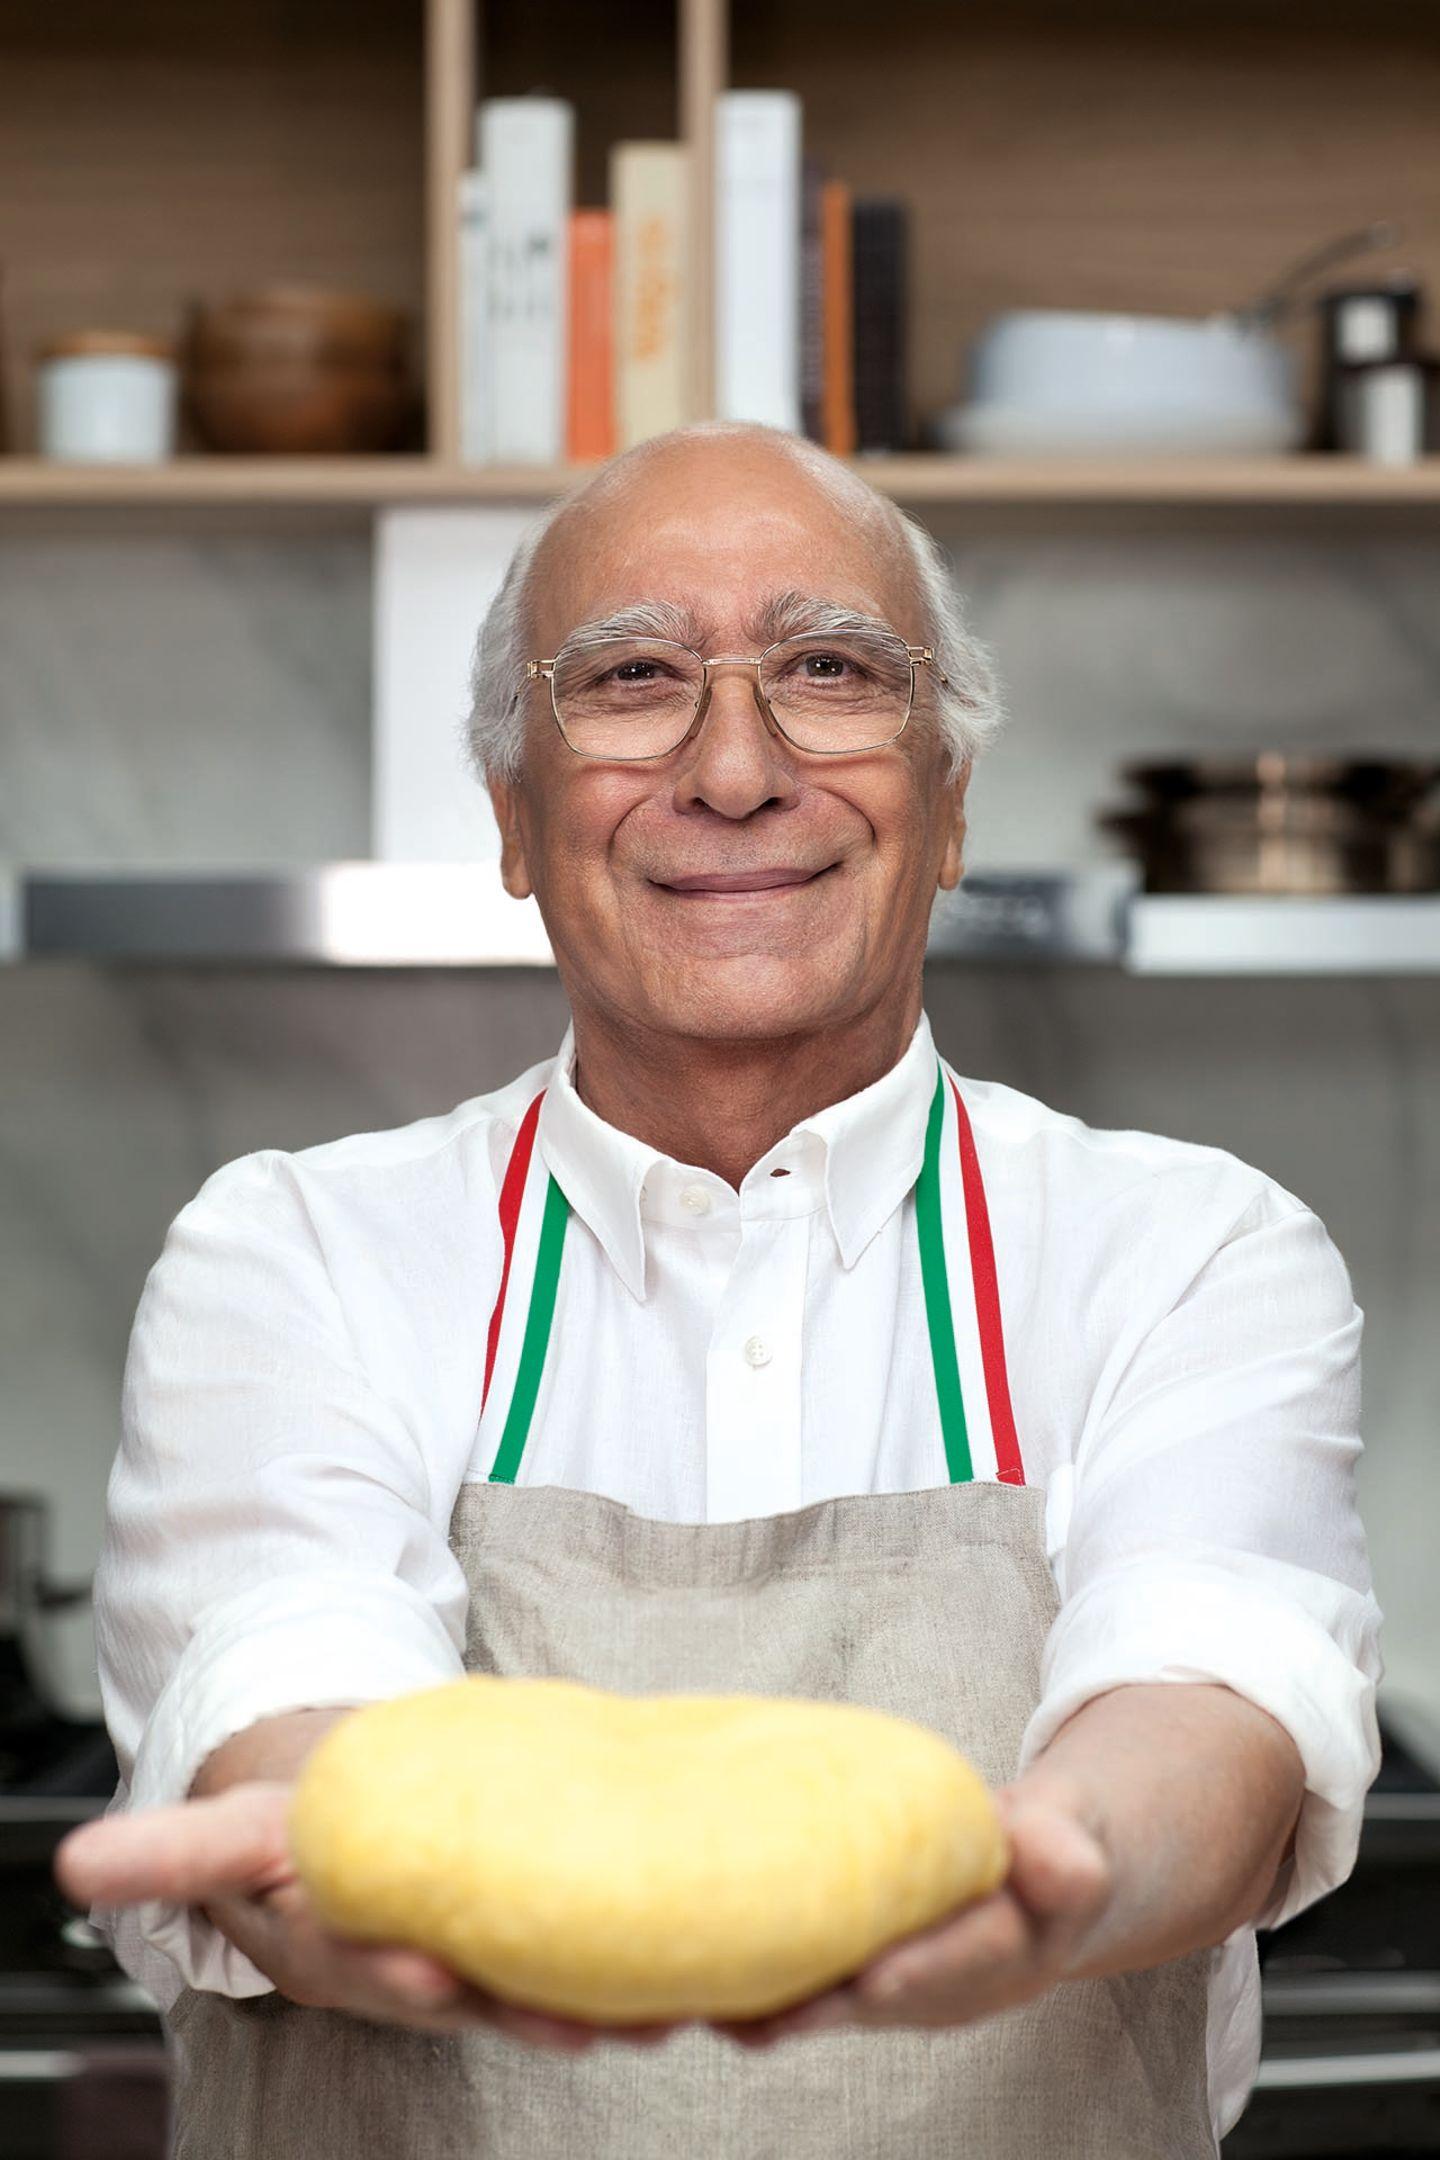 Gründer des Familienunternehmens: Giovanni Rana